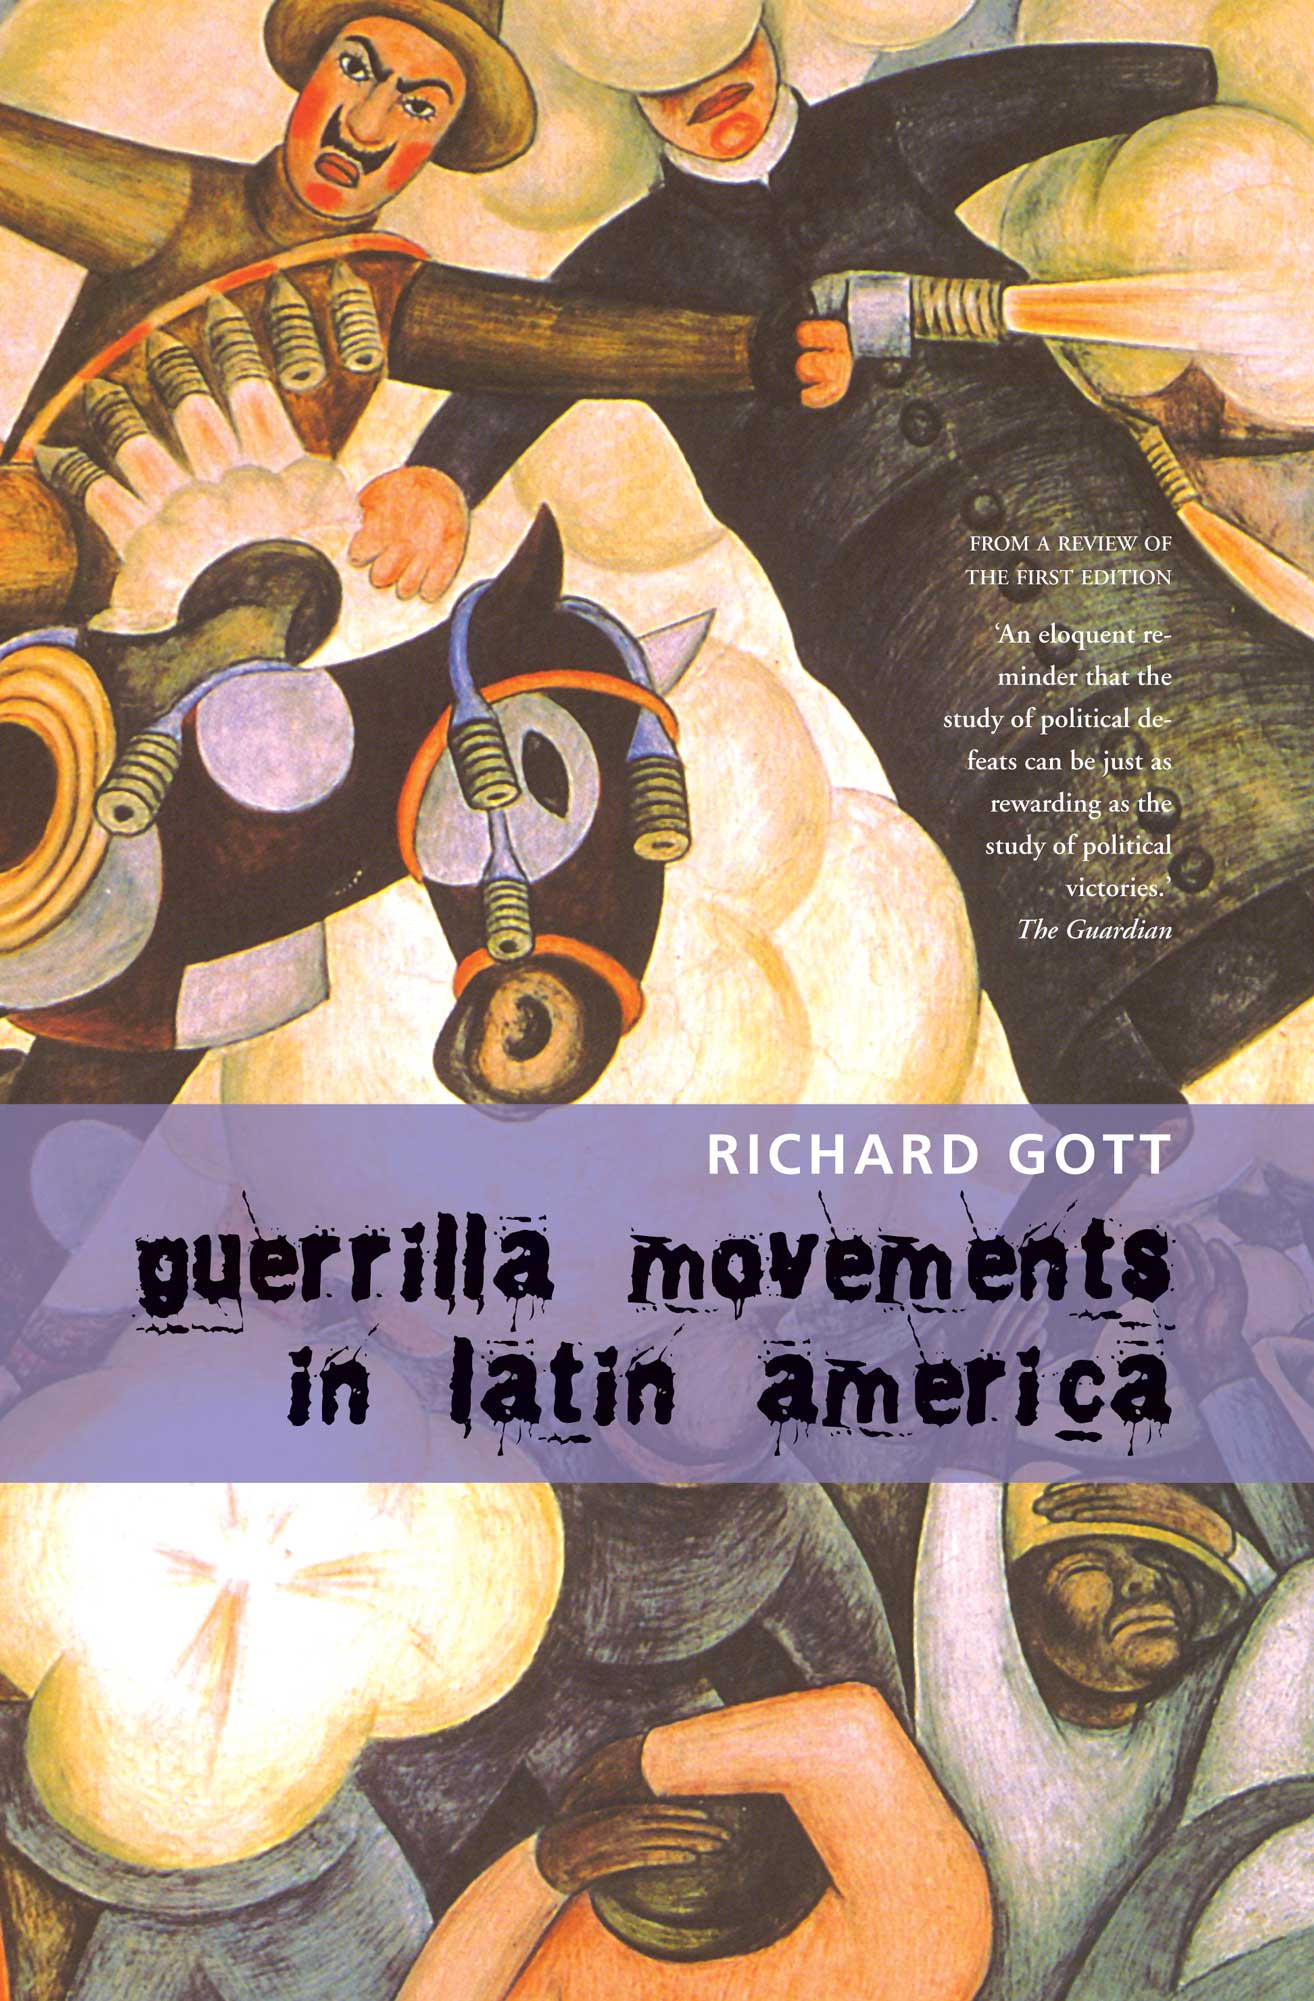 Guerrilla Movements in Latin America by Richard Gott | Seagull Books